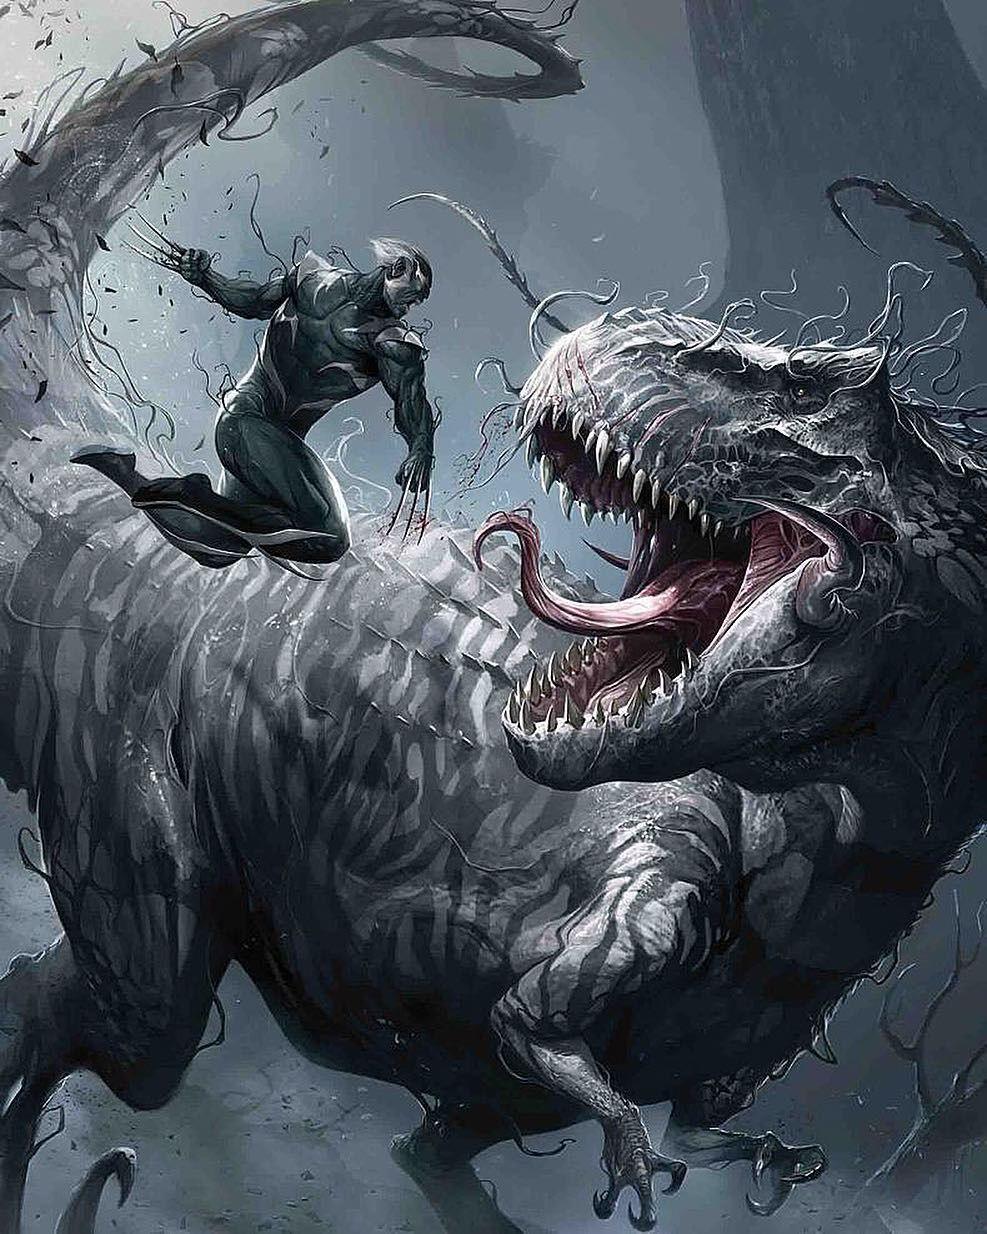 #venomverse issue 4 by Francesco Mattina Download images at nomoremutants-com.tumblr.com Key Film Dates * Spider-Man - Homecoming: Jul 7, 2017 * Thor: Ragnarok: Nov 3, 2017 * Black Panther: Feb 16, 2018 * New Mutants: Apr 13, 2018 * The Avengers:...